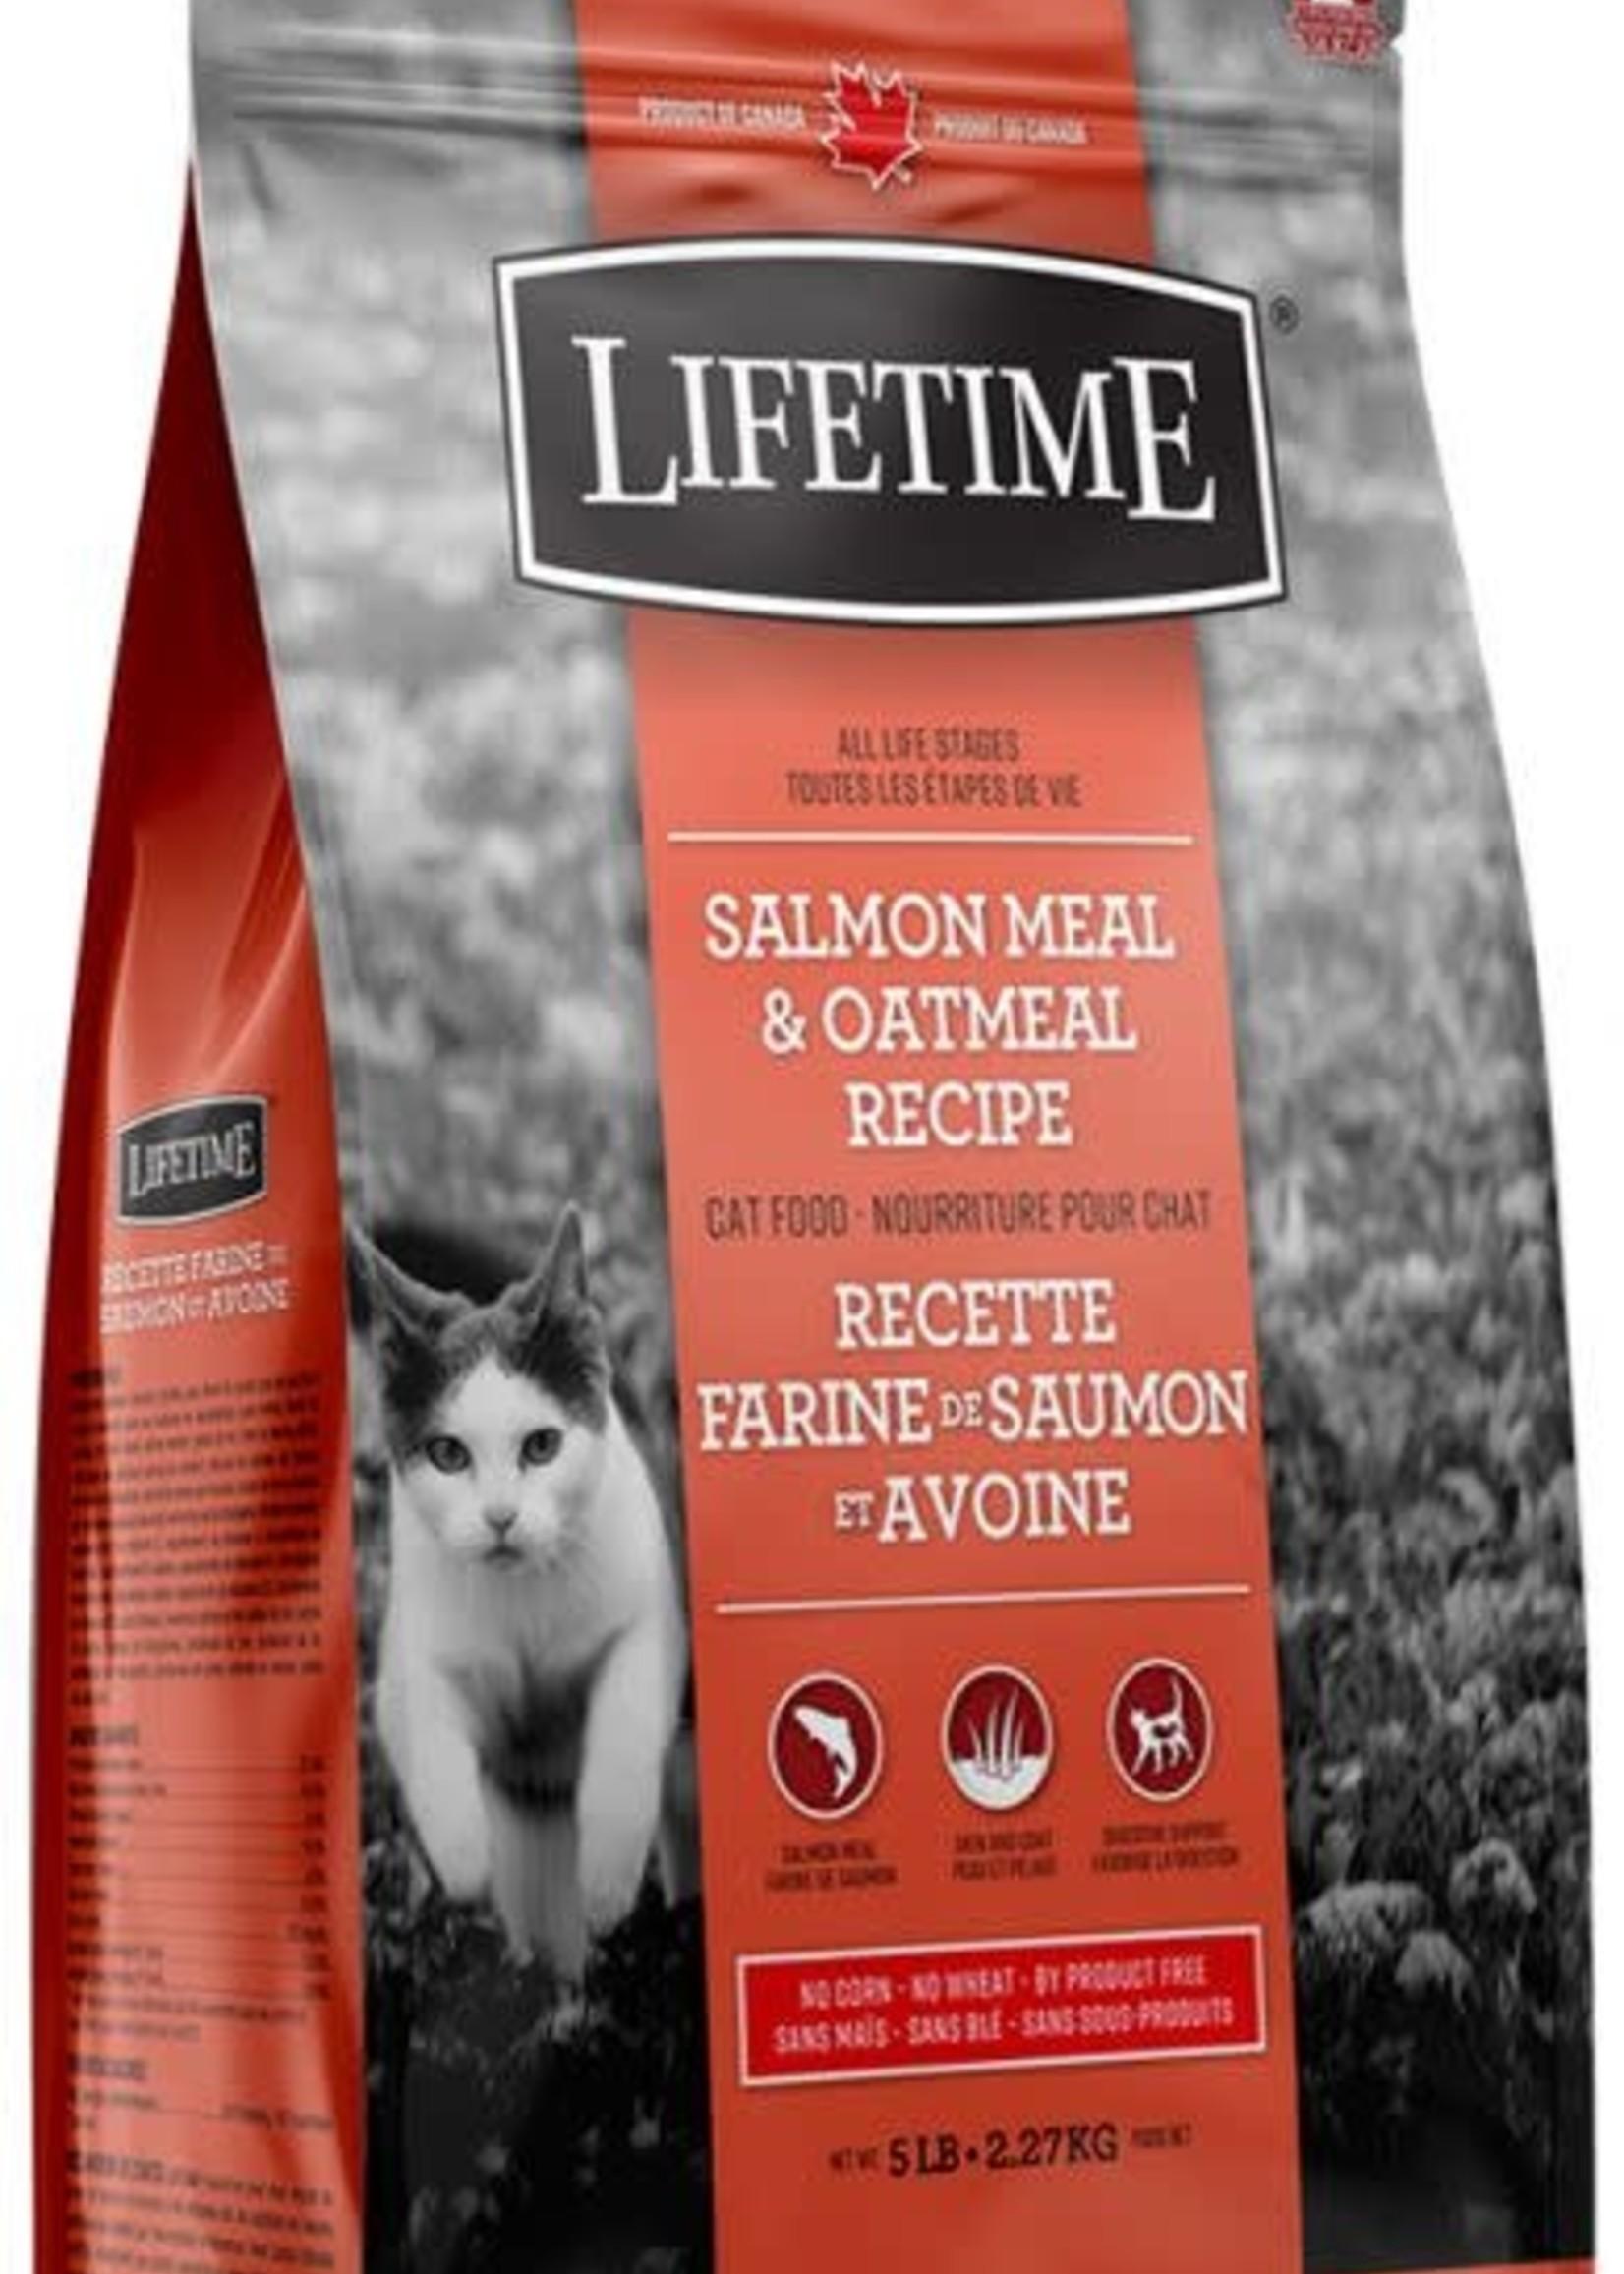 LifeTime® LifeTime Salmon Meal & Oatmeal Recipe 5lbs